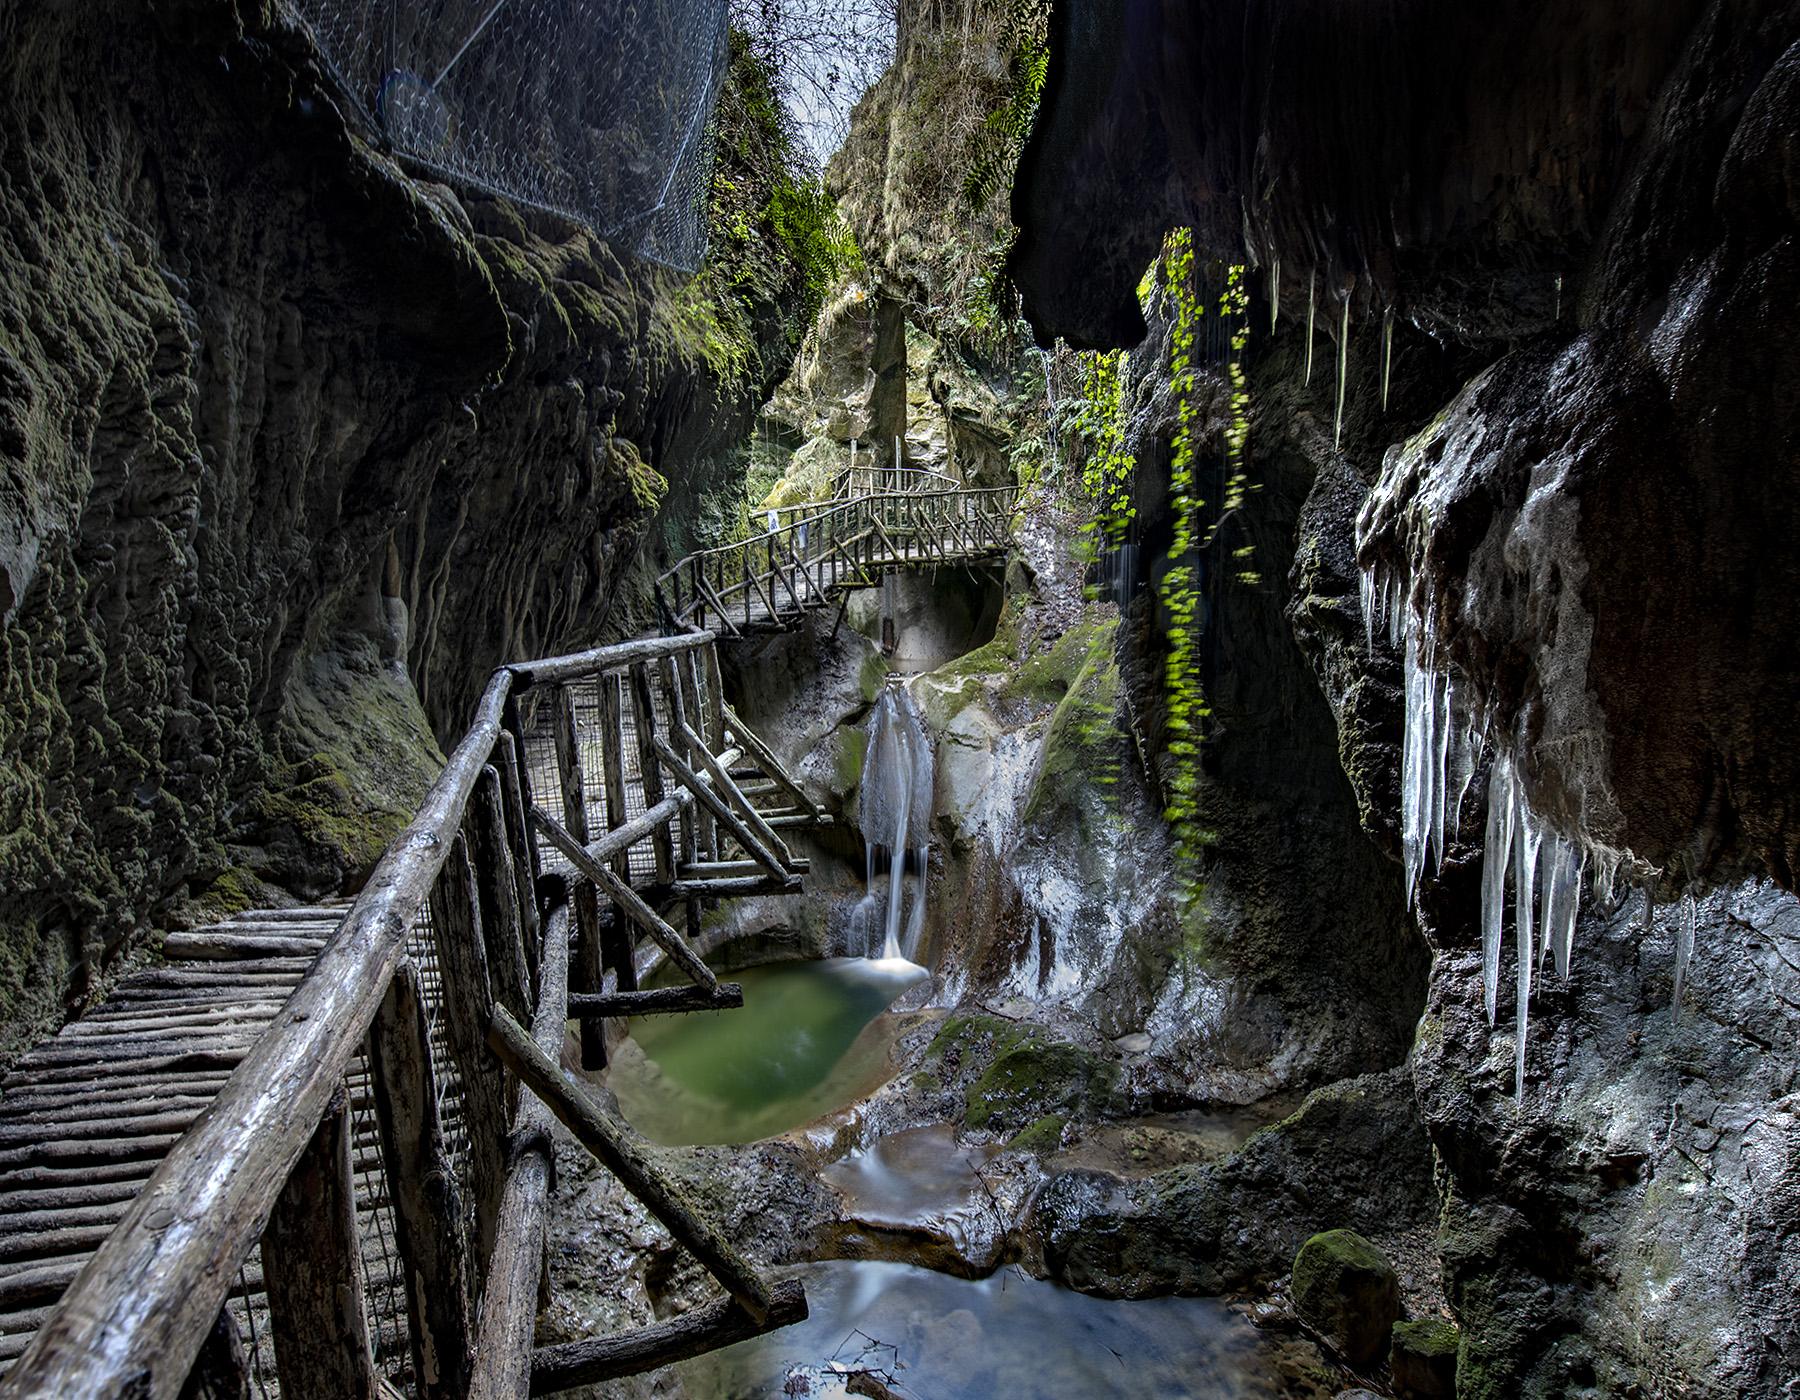 Grotte del Caglieron Fregona (tv)...